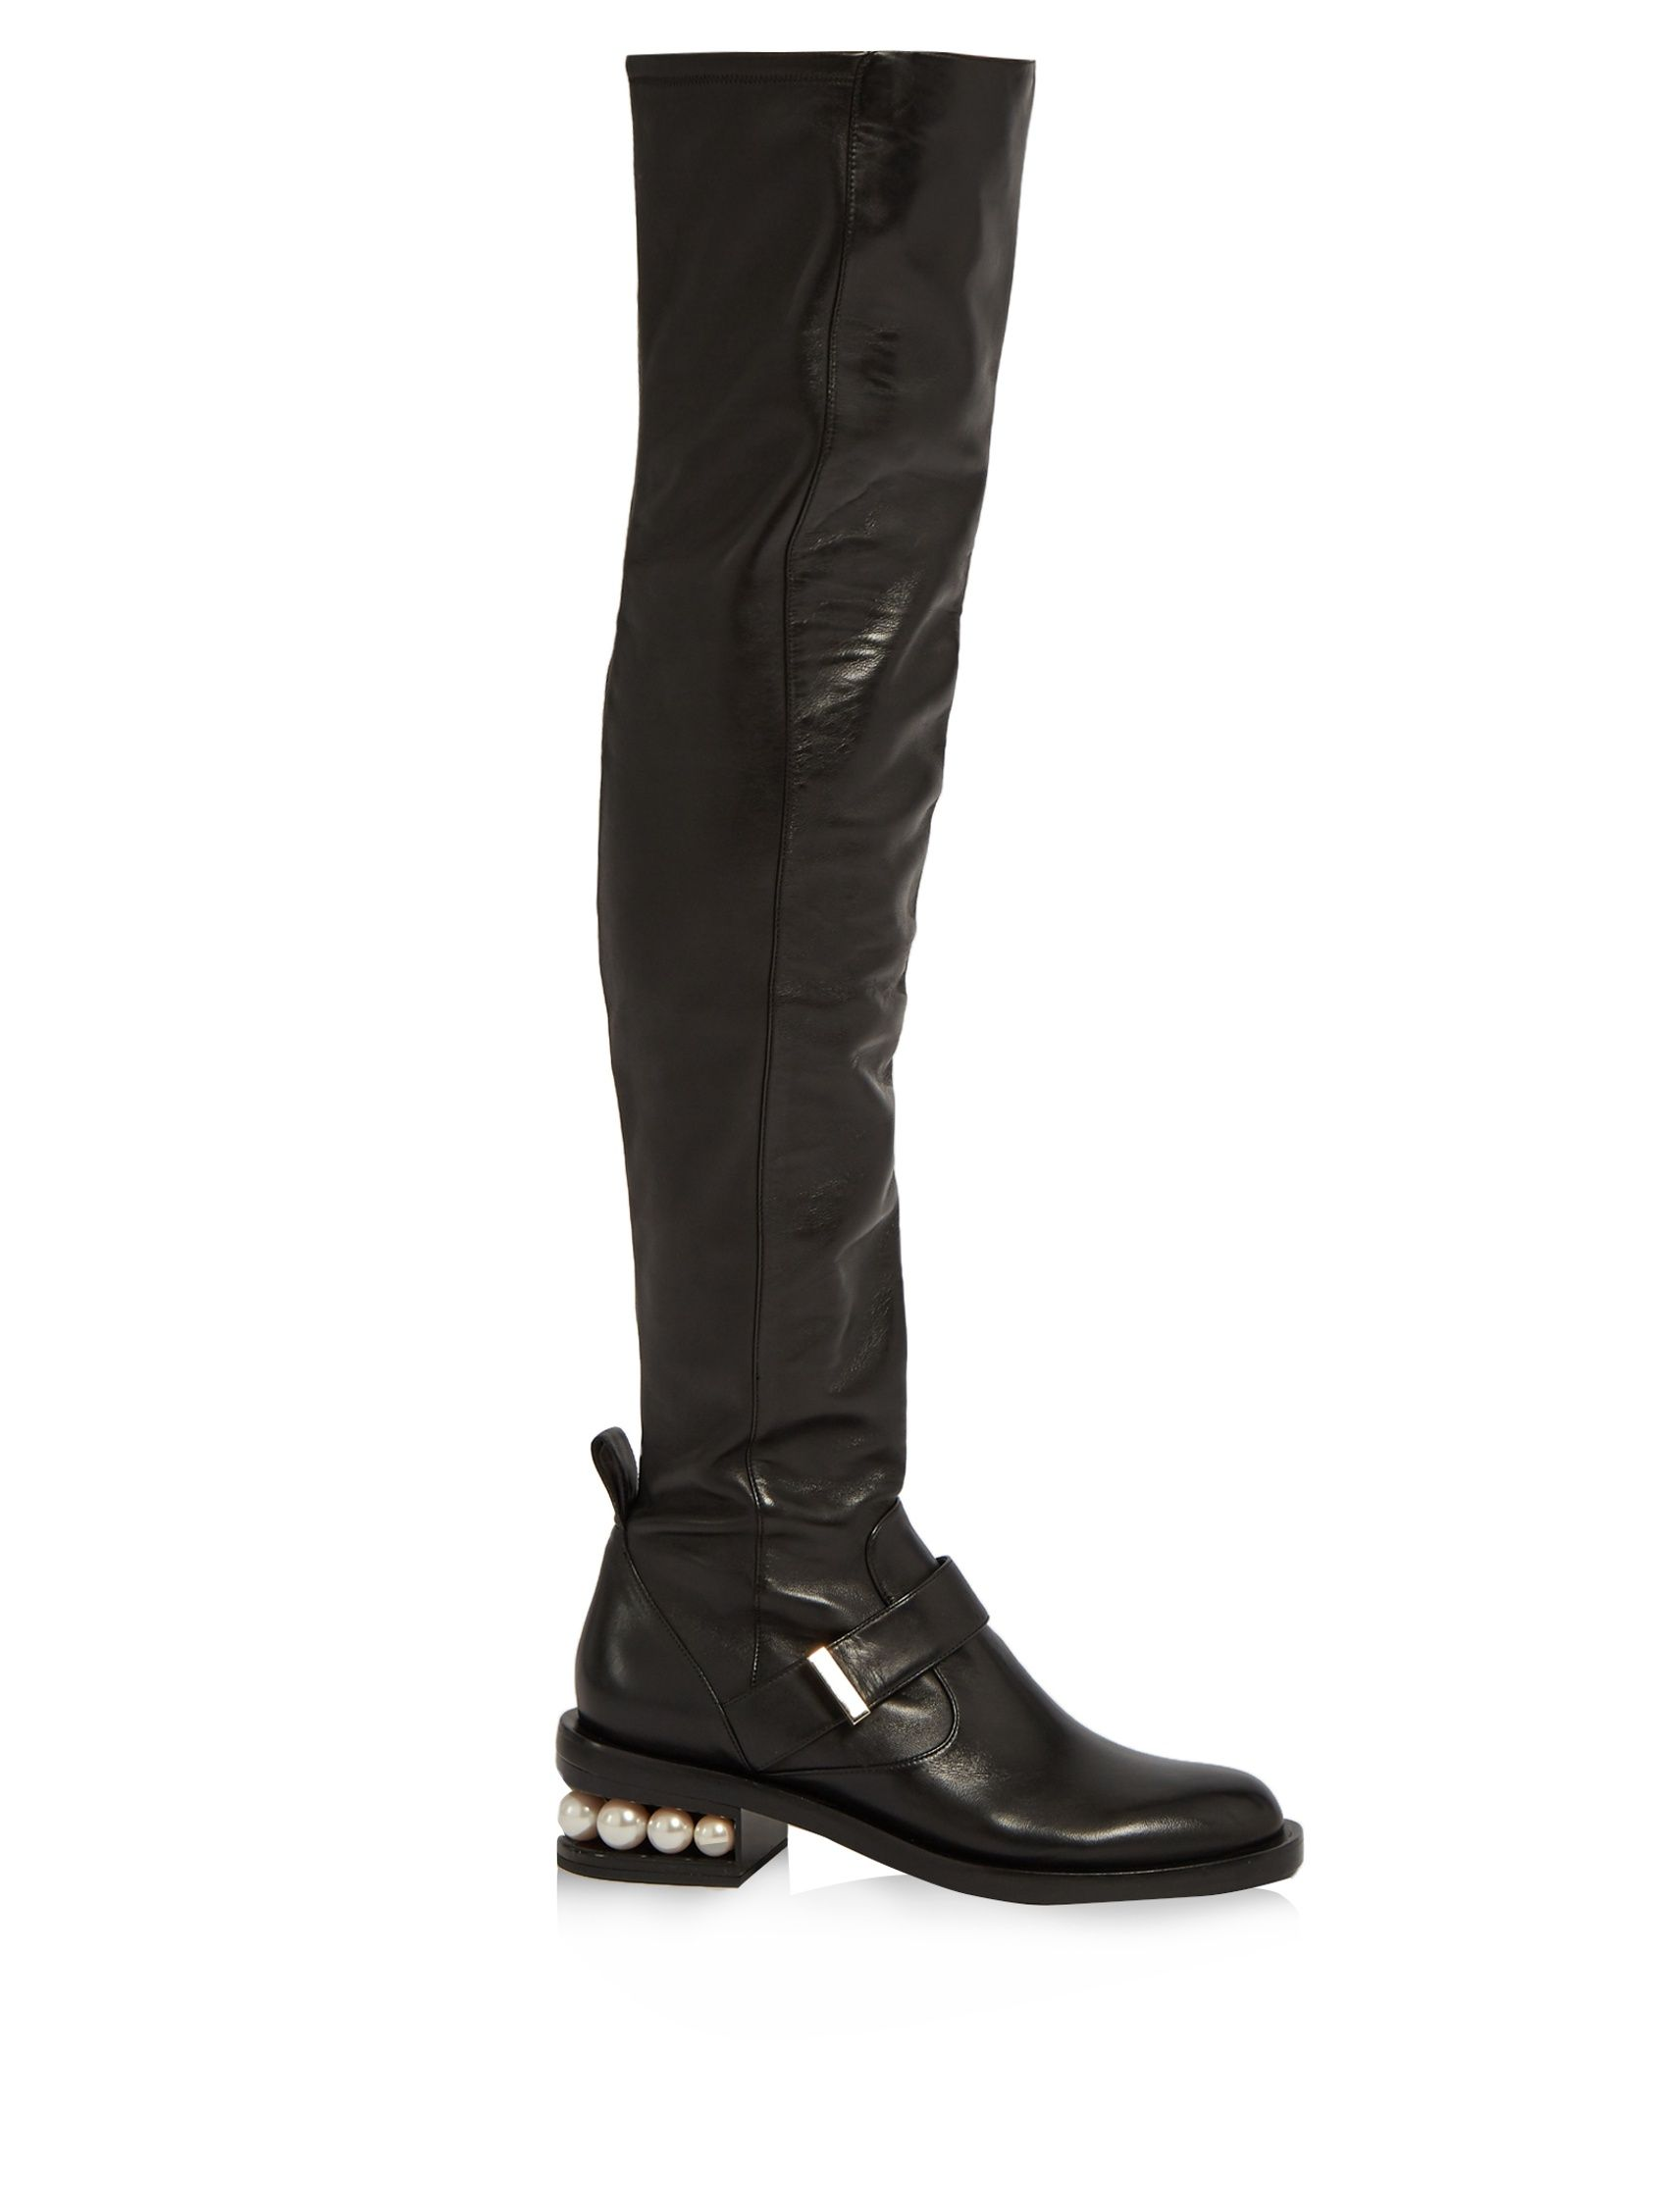 Nicholas Kirkwood Leather Cowboy Boots aoIesYu